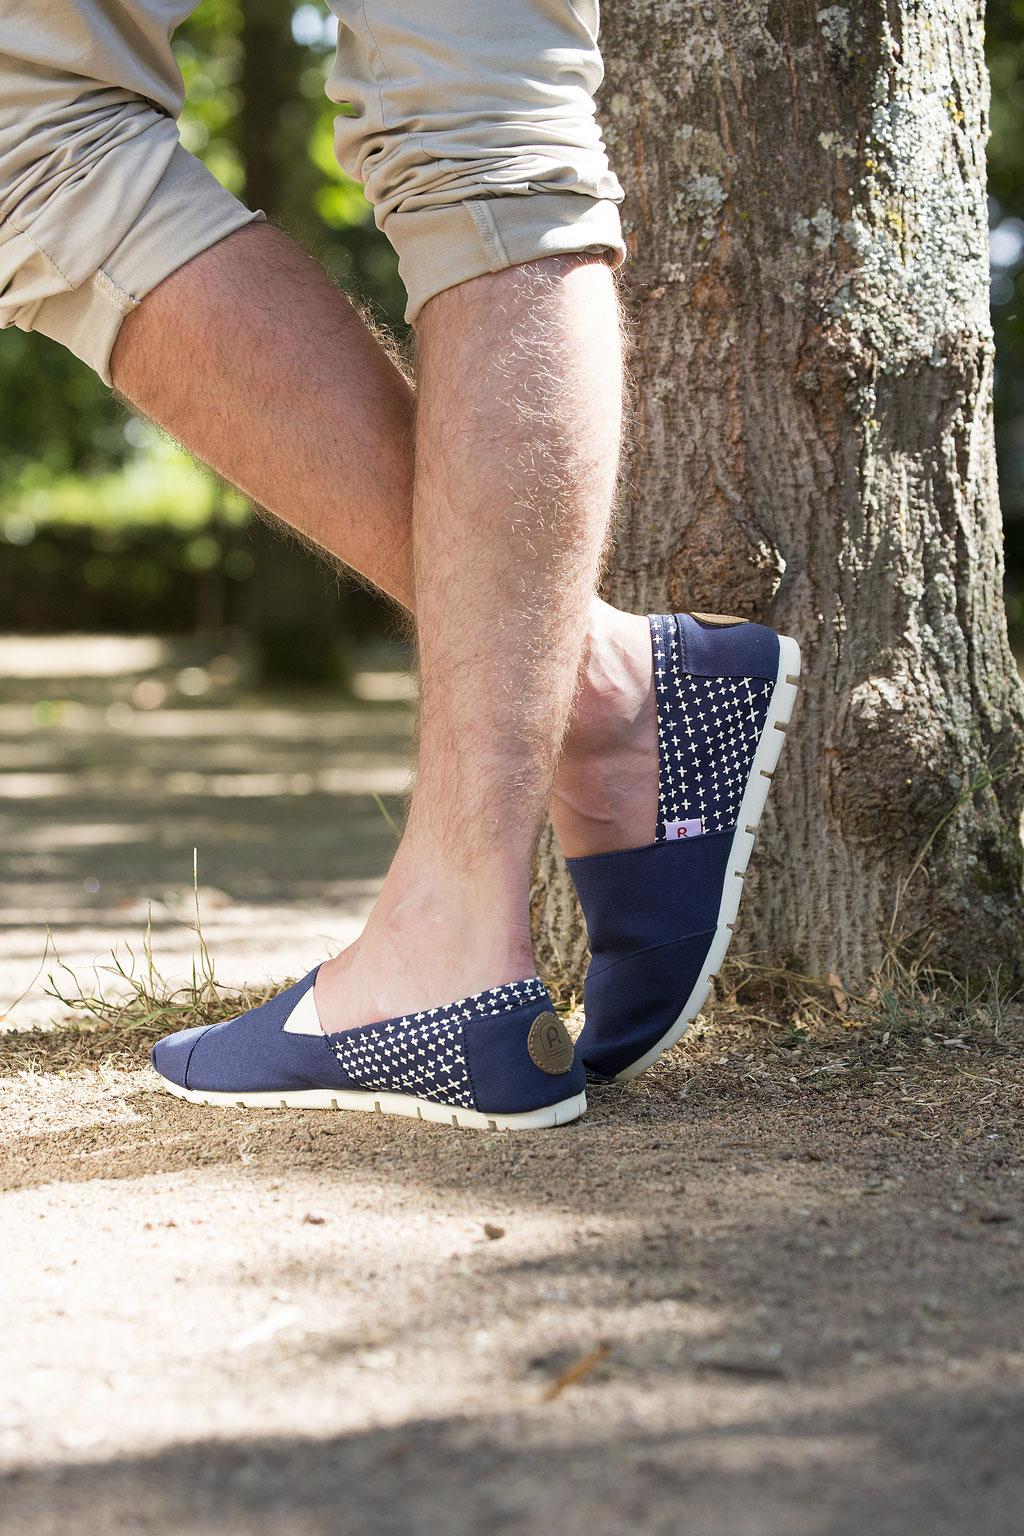 ©Rouchette-Enjoy-Classic-marine-etoile-chaussure-toile-canvas